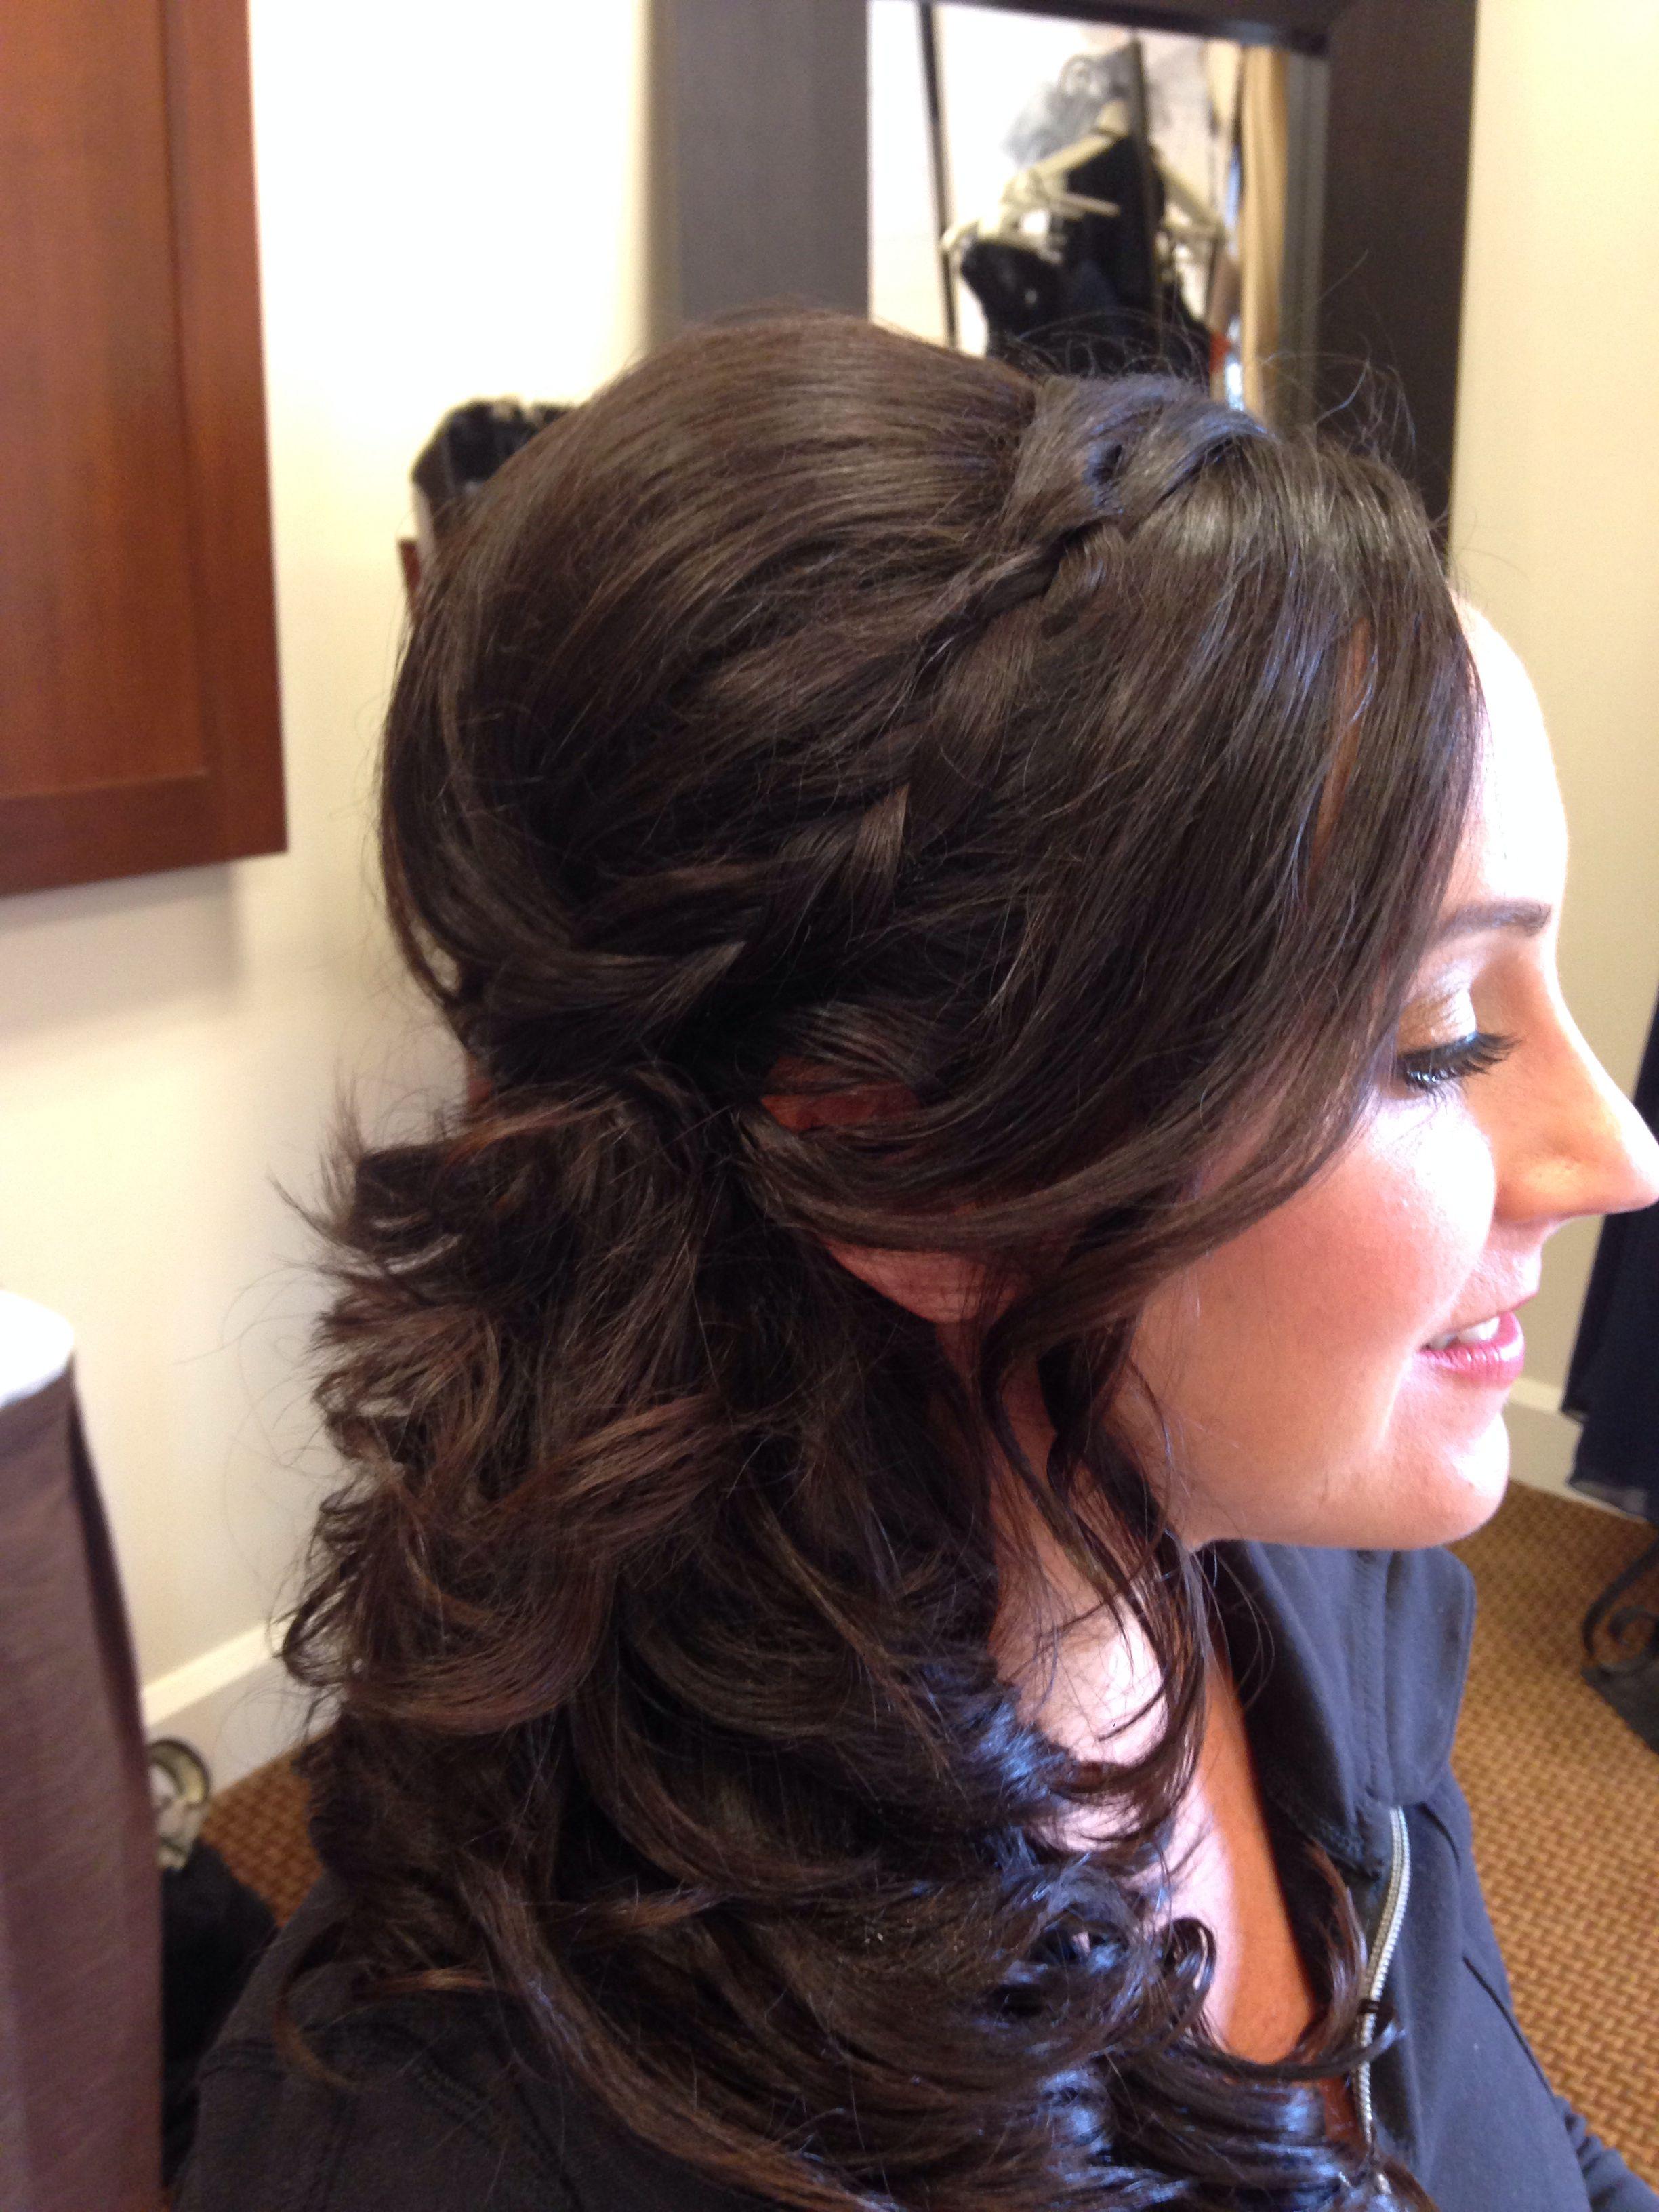 half up do side swoop bangs bridesmaid romantic curls | hair